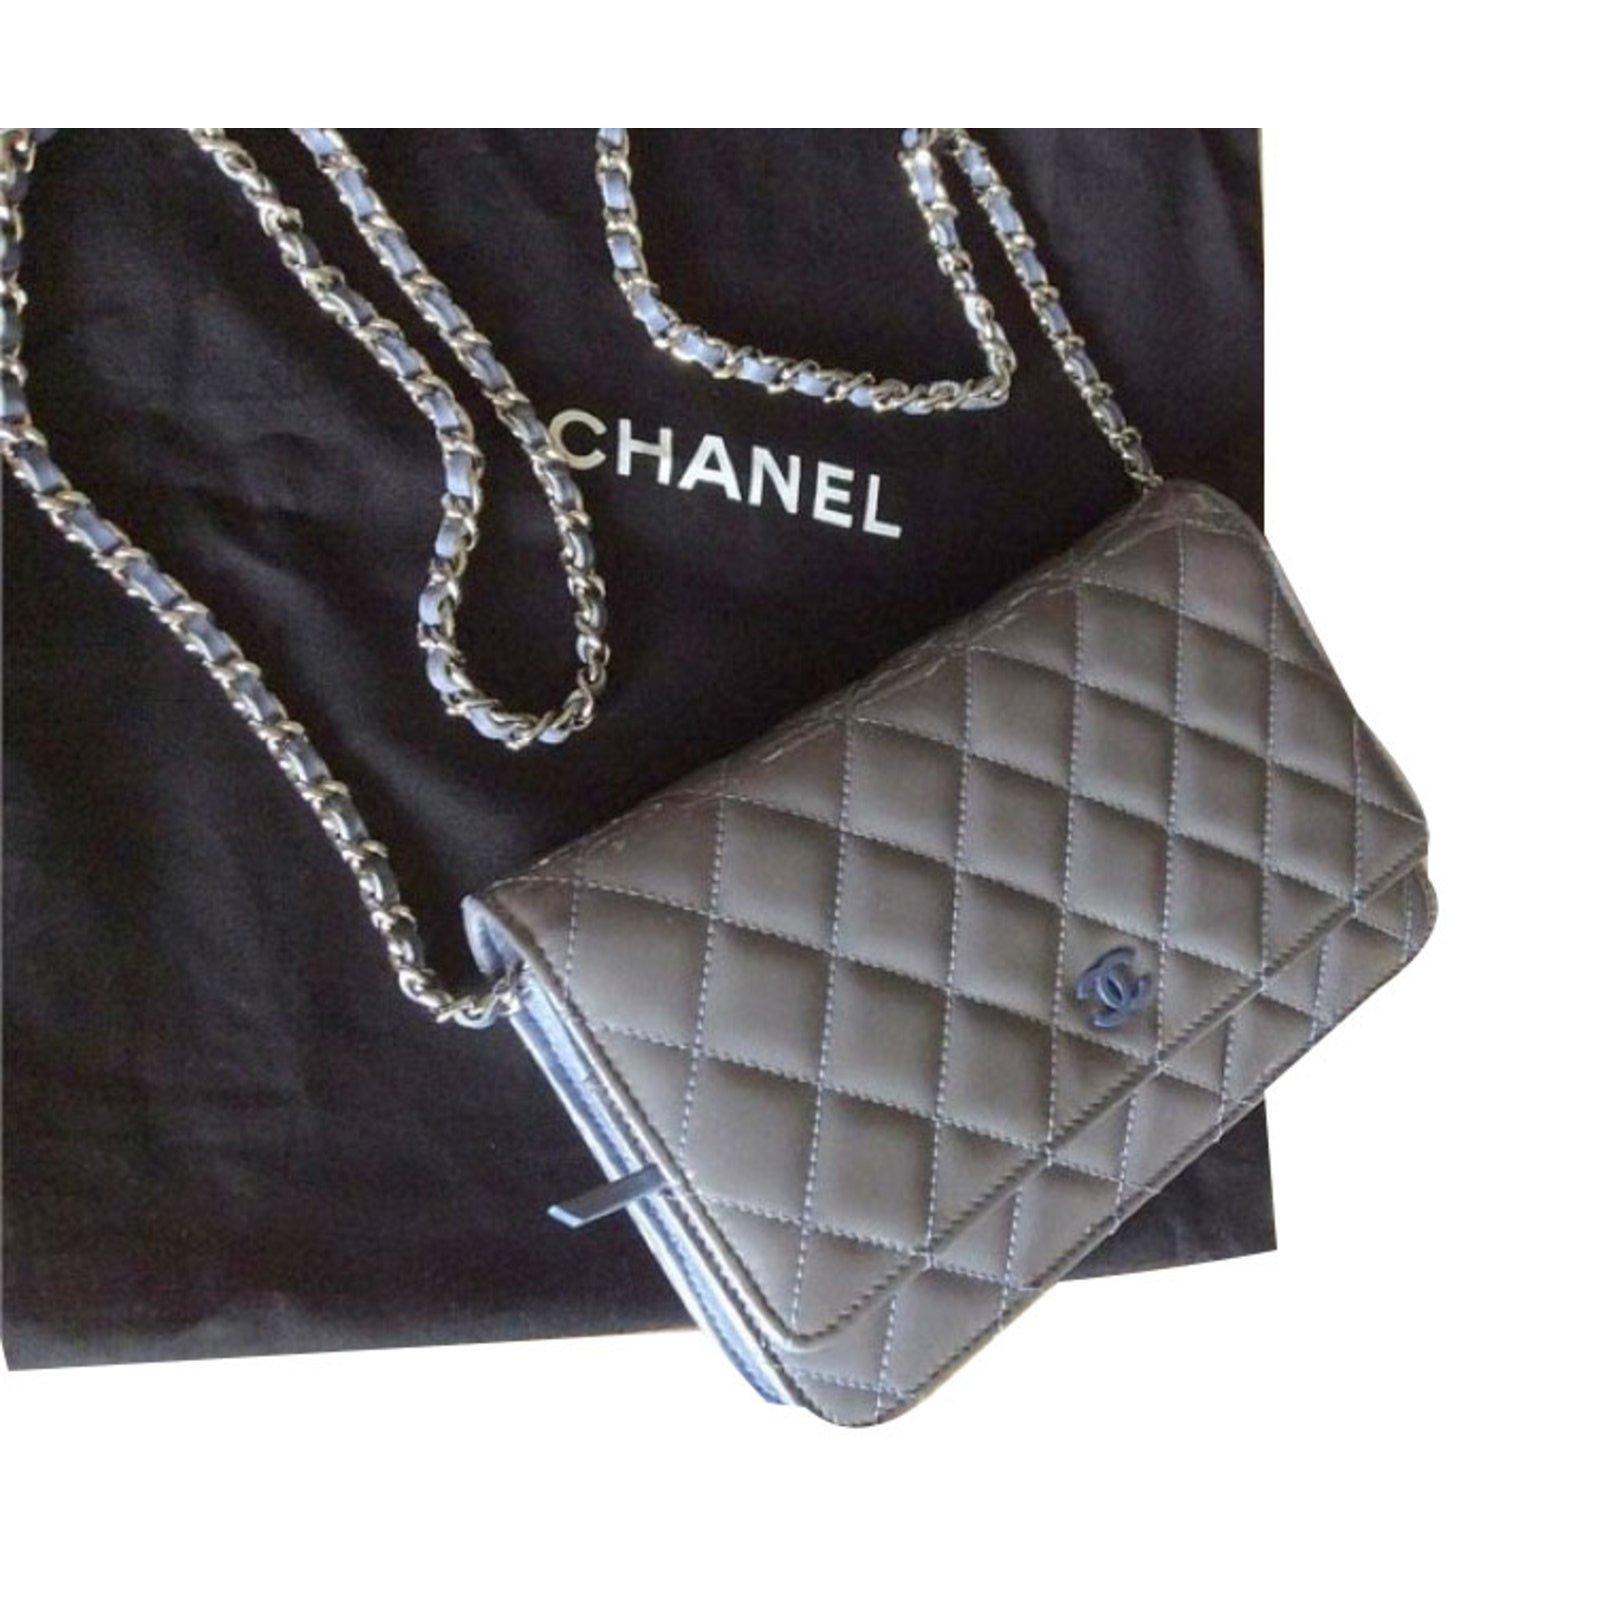 541c19512359 Chanel WOC Handbags Patent leather Grey ref.55268 - Joli Closet